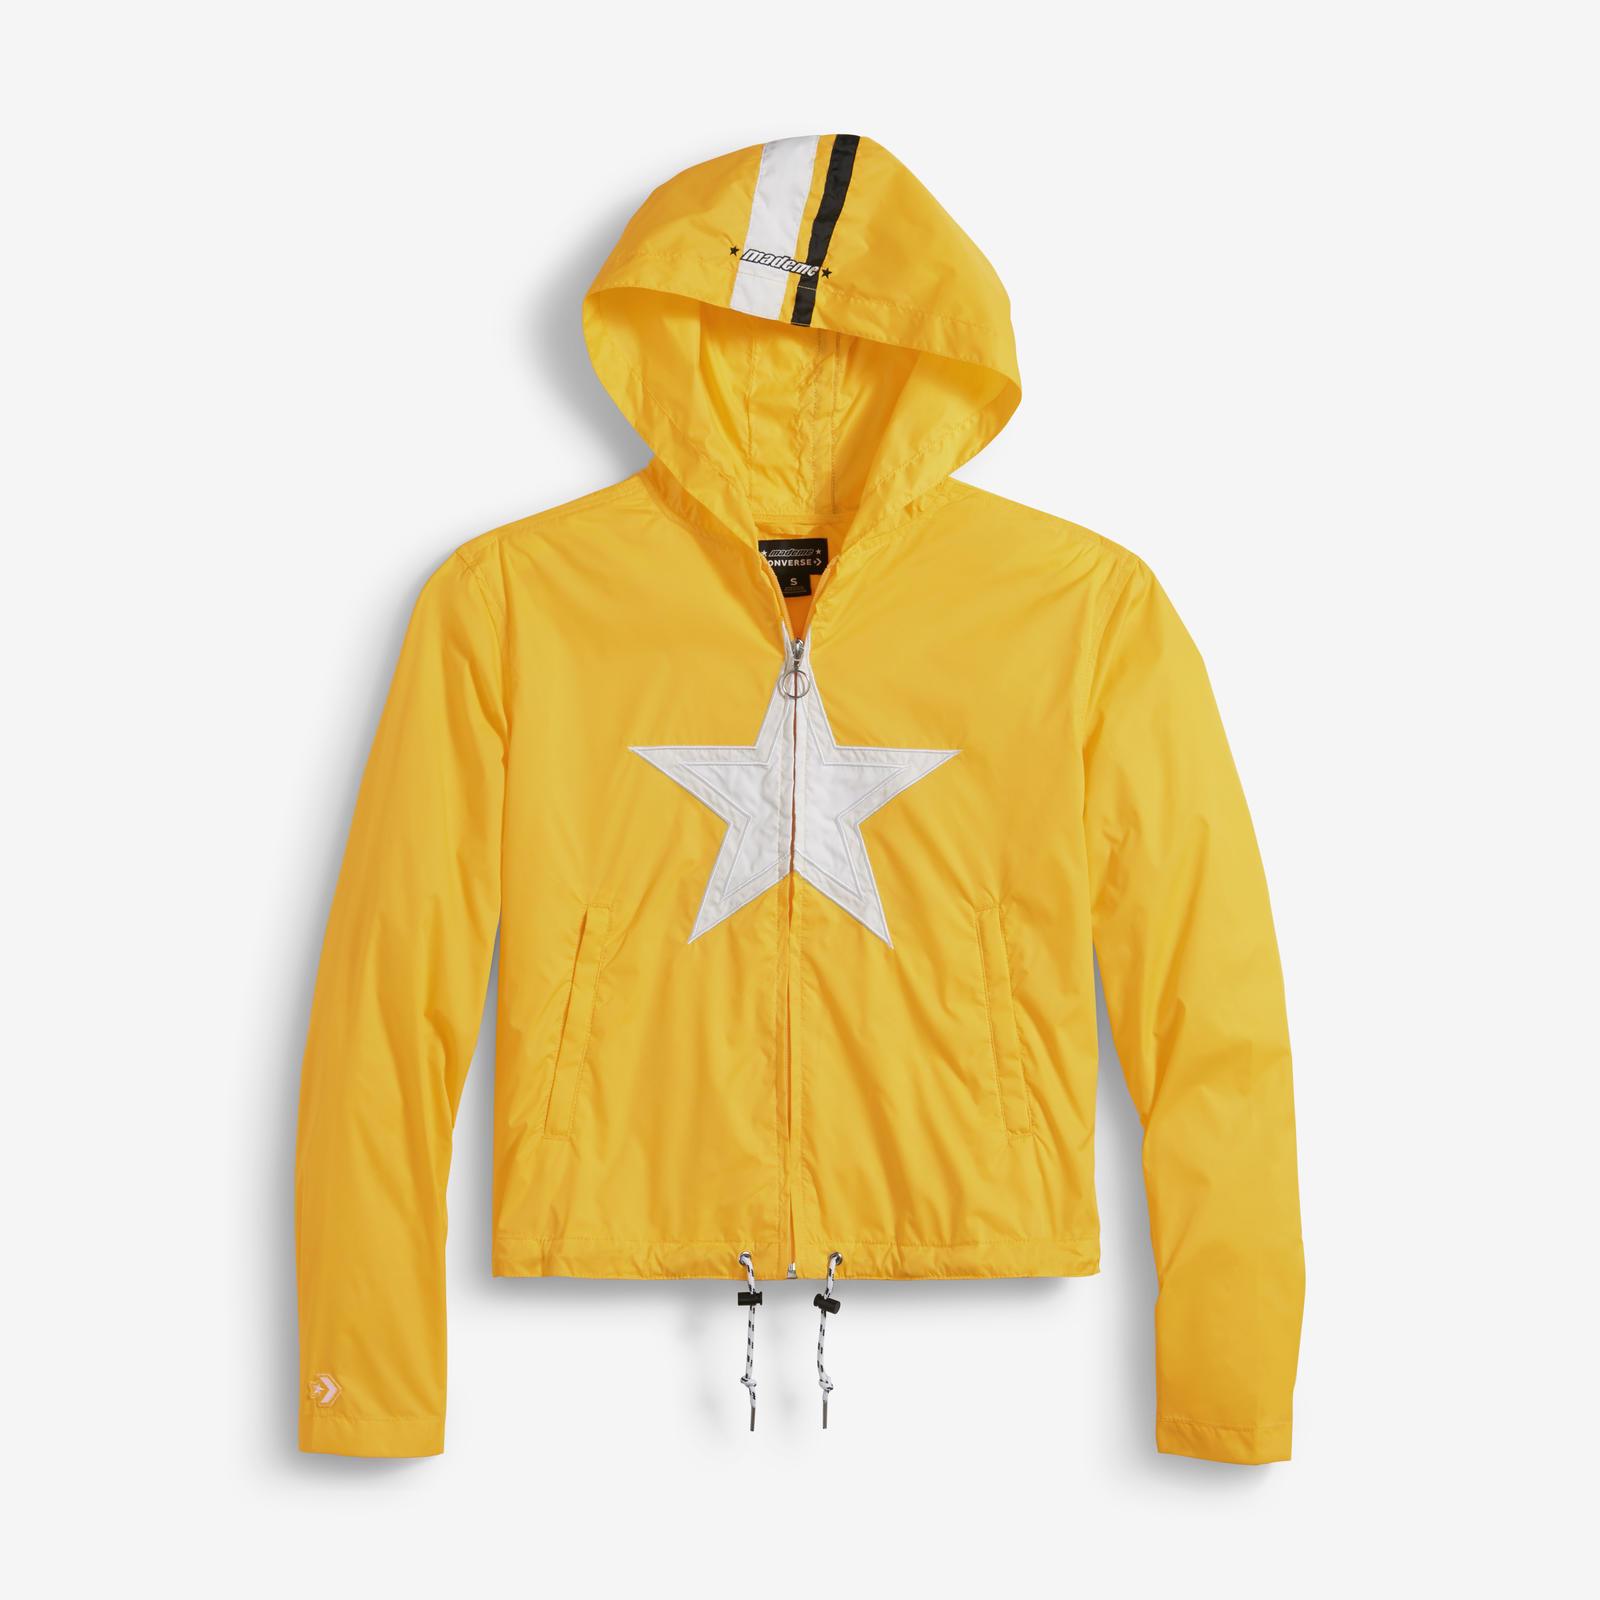 mademe oversized hoodie release date ea5c73d8